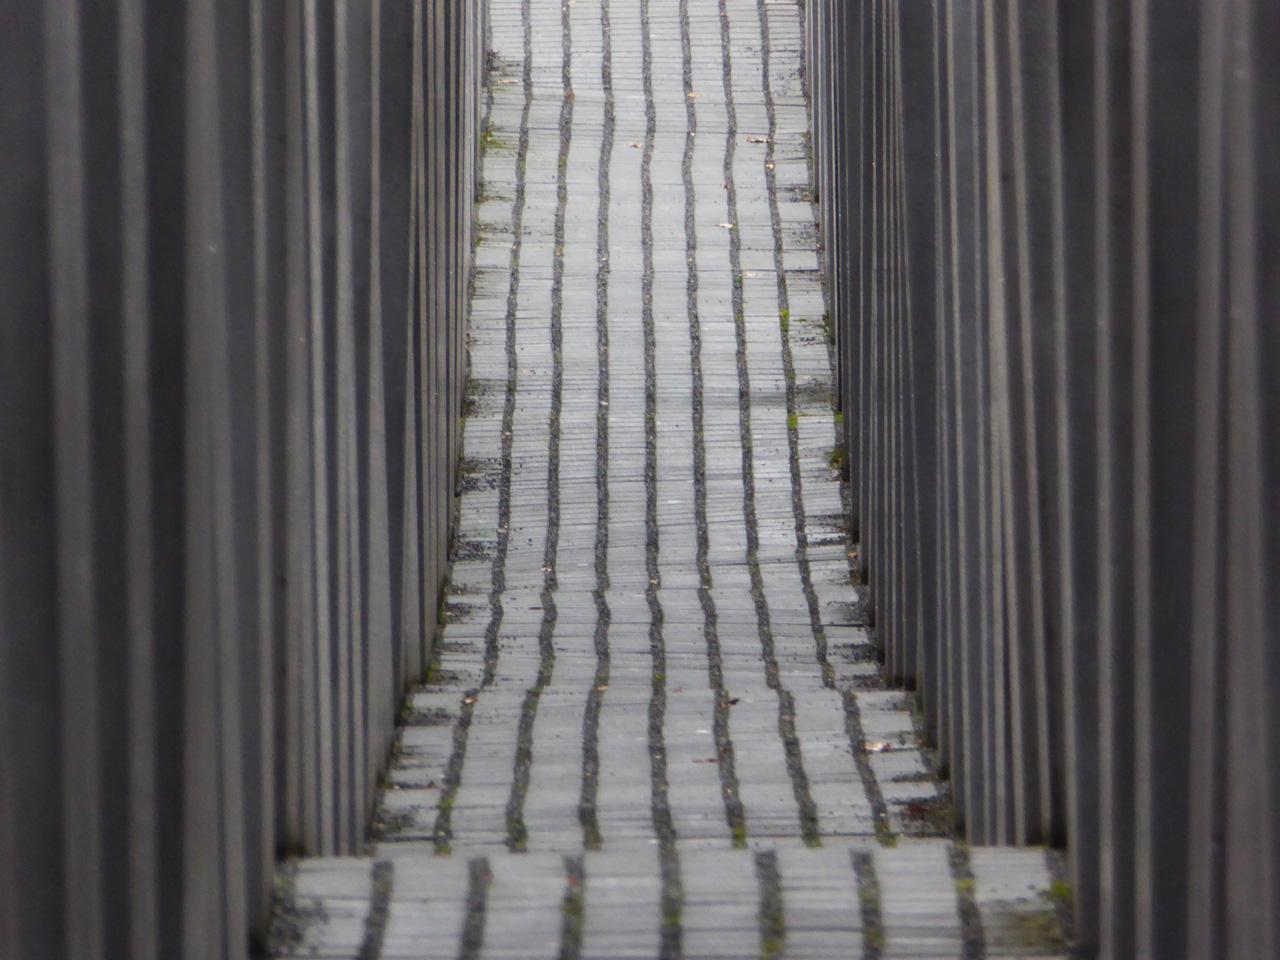 holocaust-Manhal-Eisenman Memorial to the Murdered Jews of Europe - Peter Eisenman